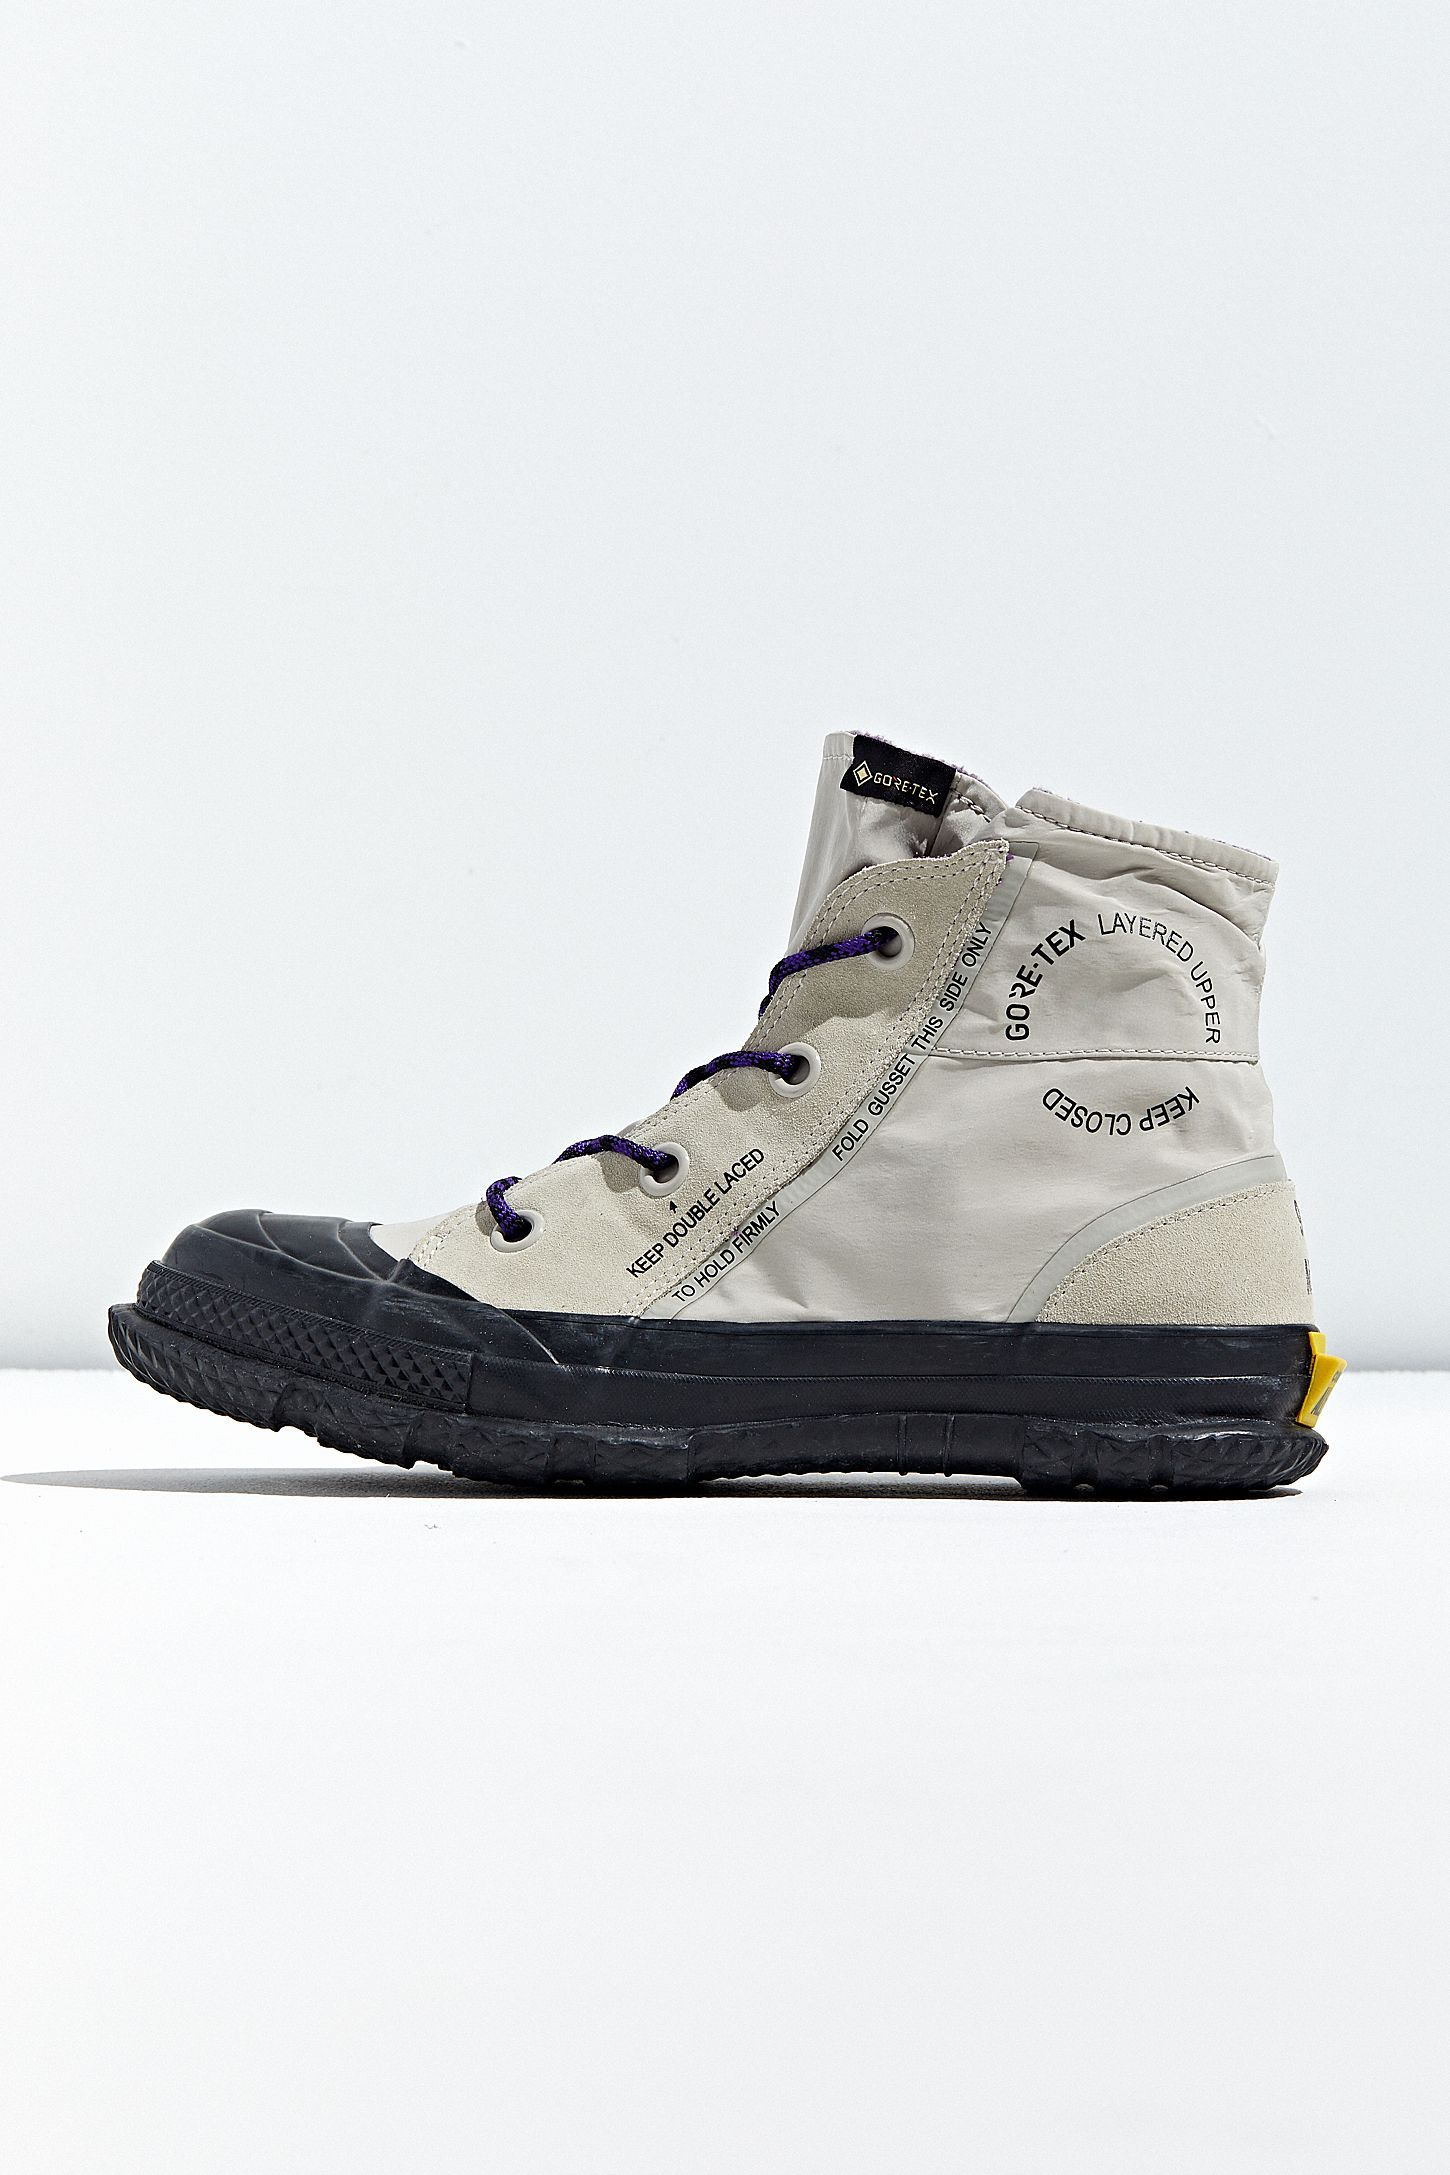 goretex zapatillas nike